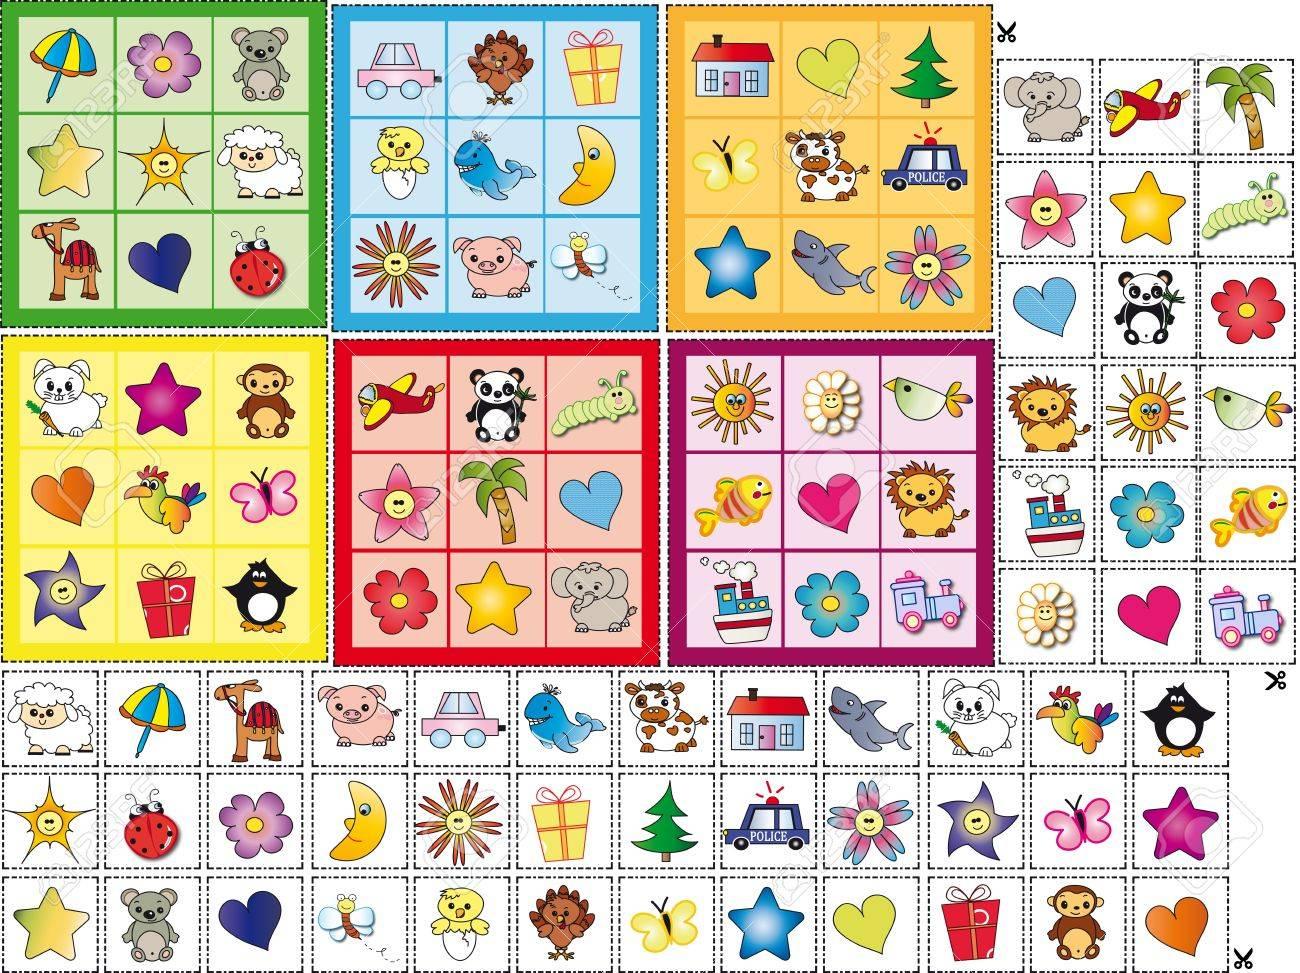 game for children Stock Photo - 15976138